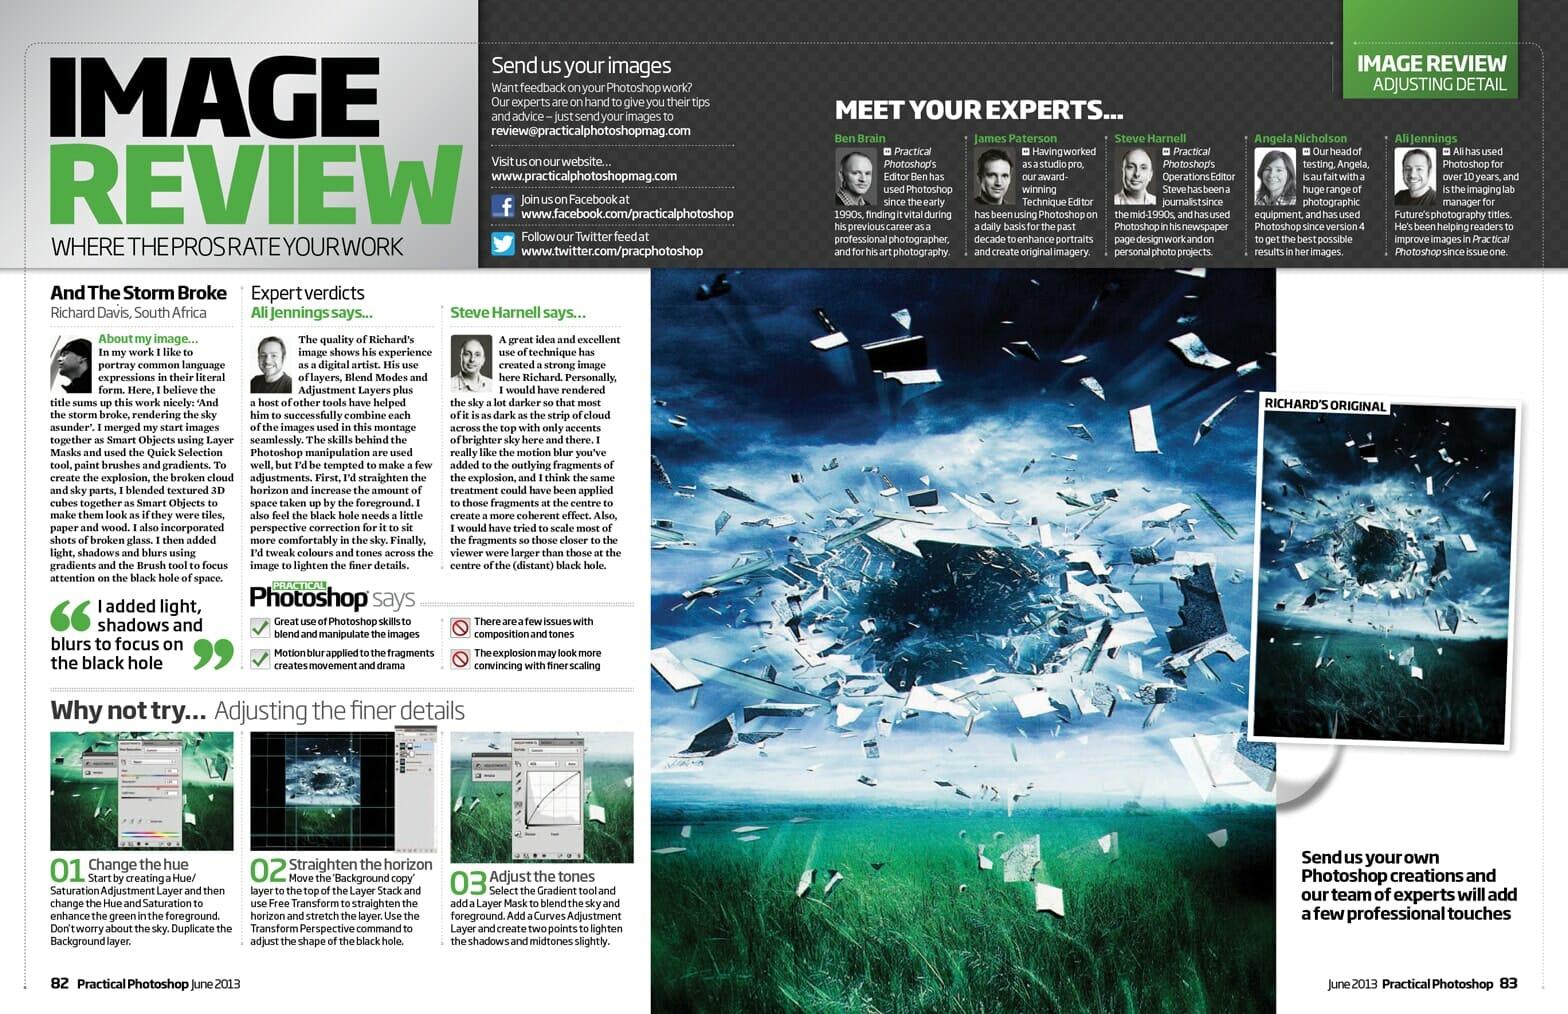 Practical Photoshop June 2013 magazine Image Review